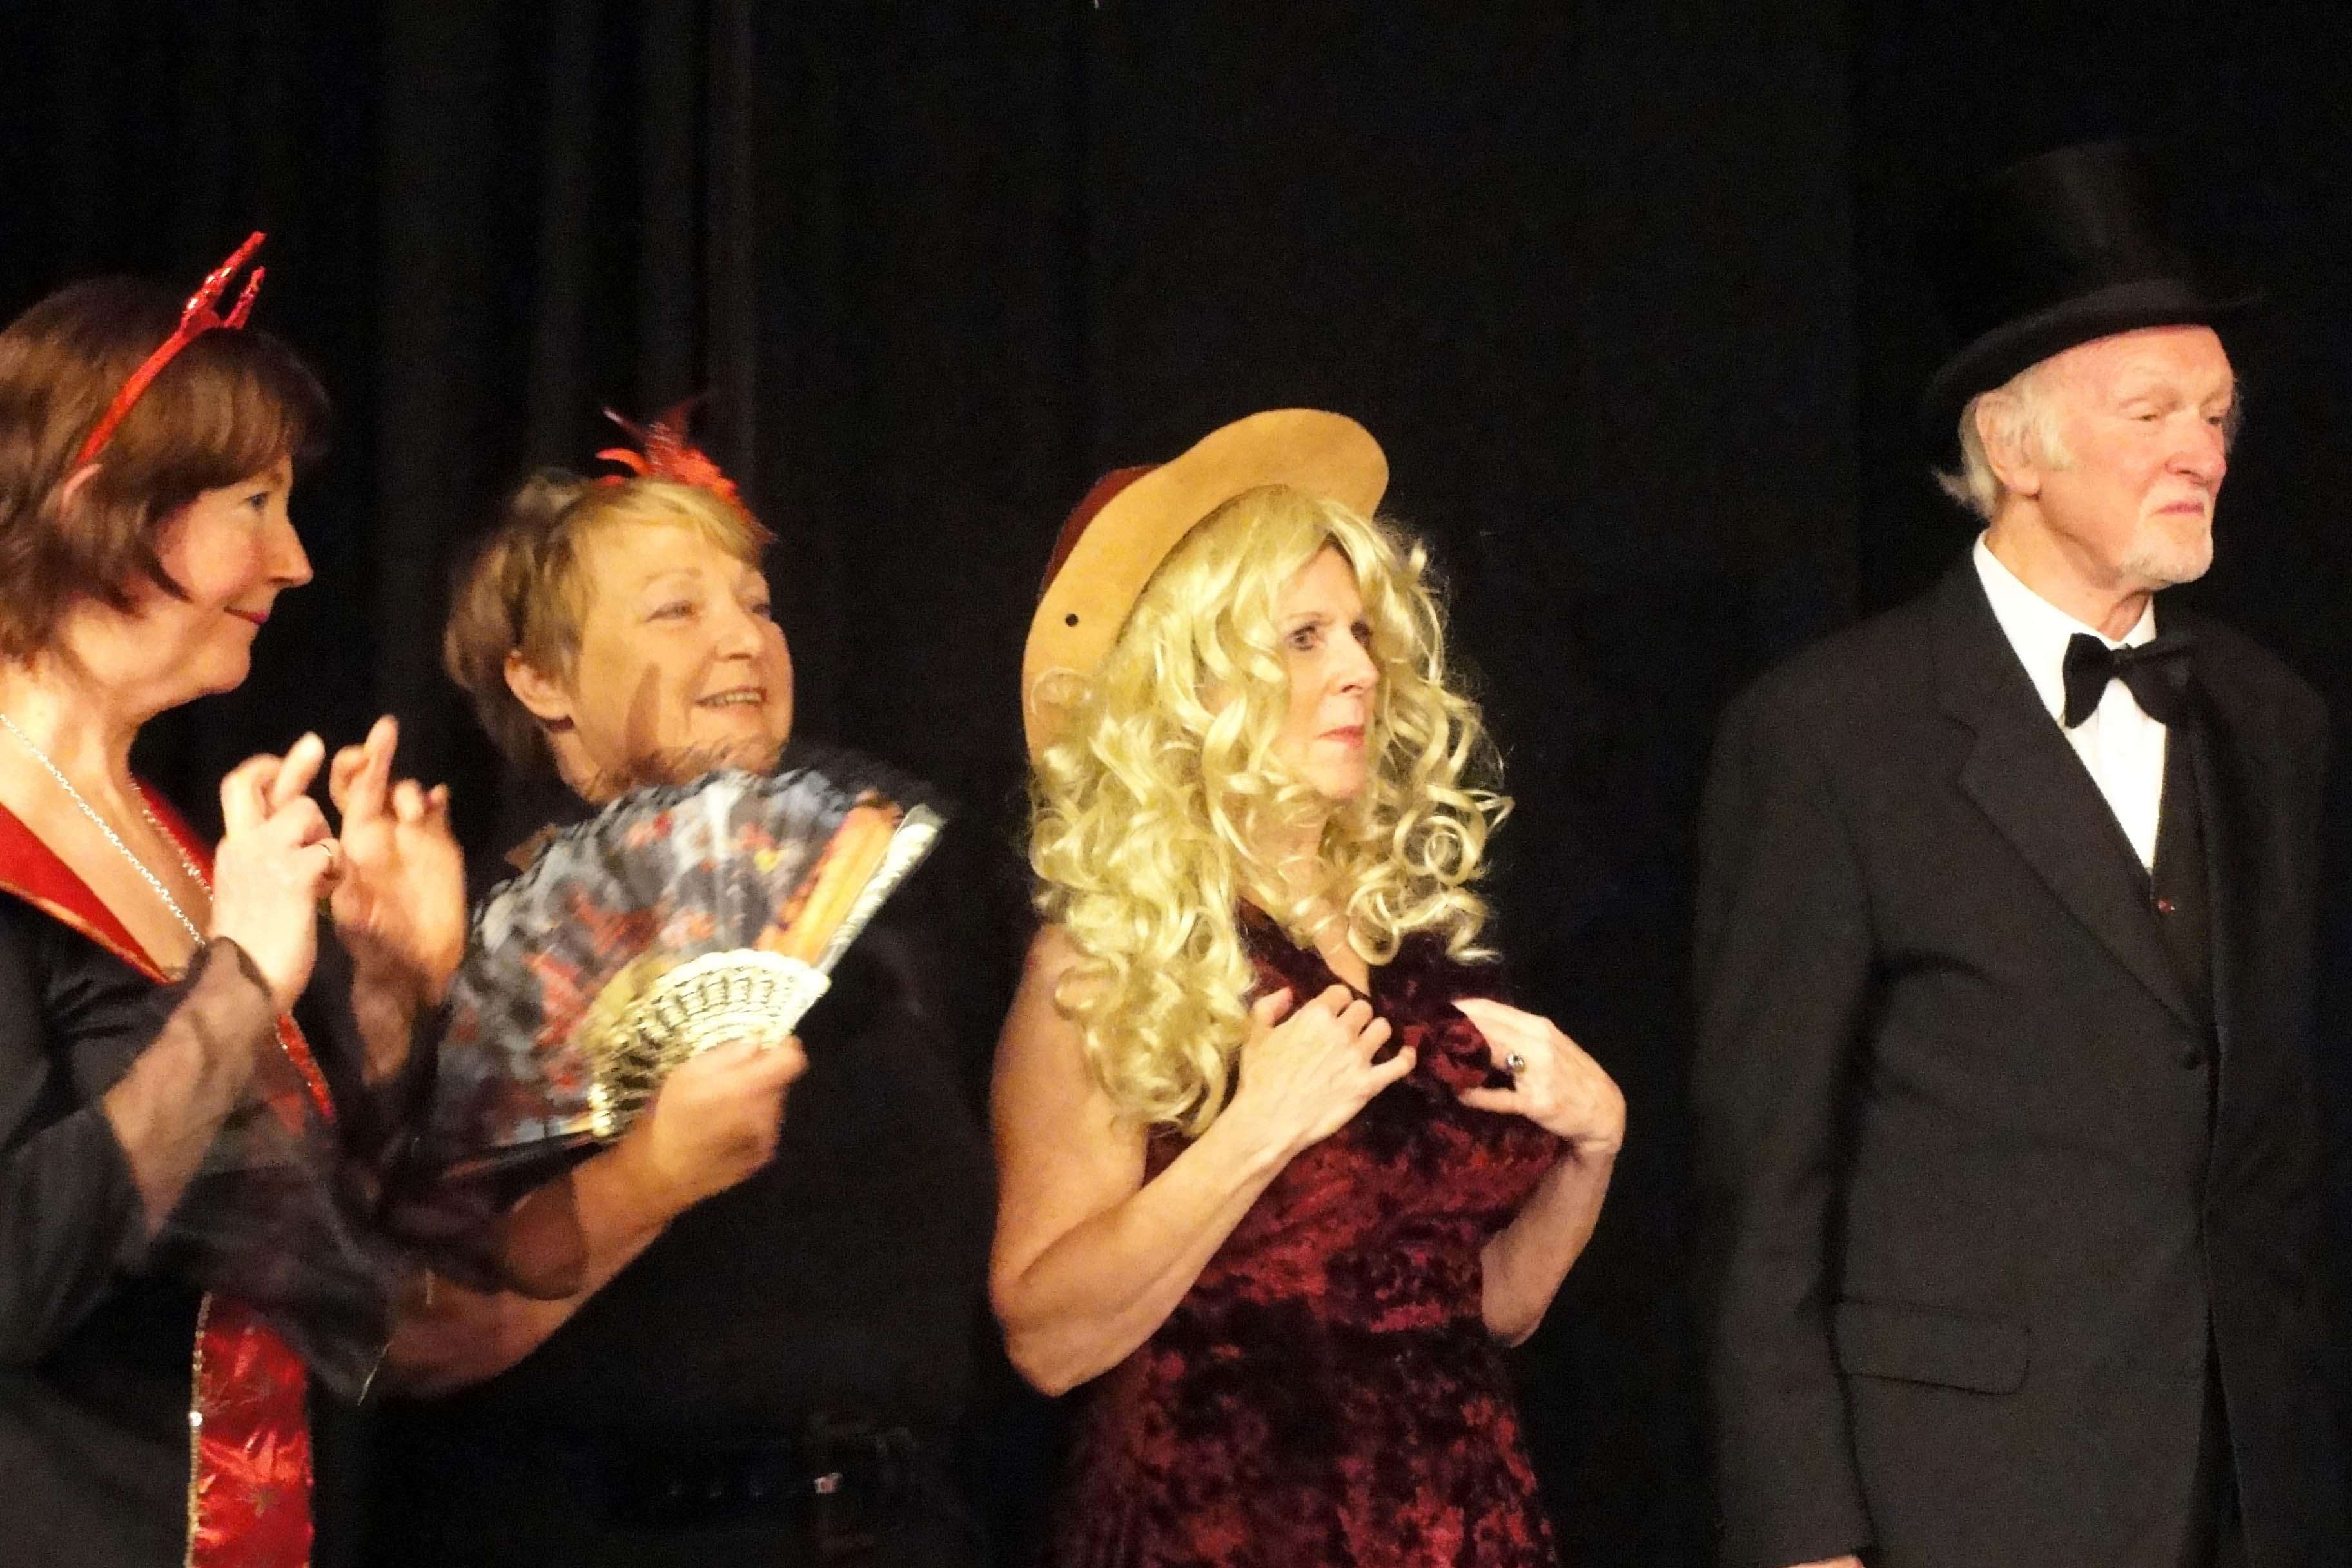 201210 Last Tango in Whitby (21)